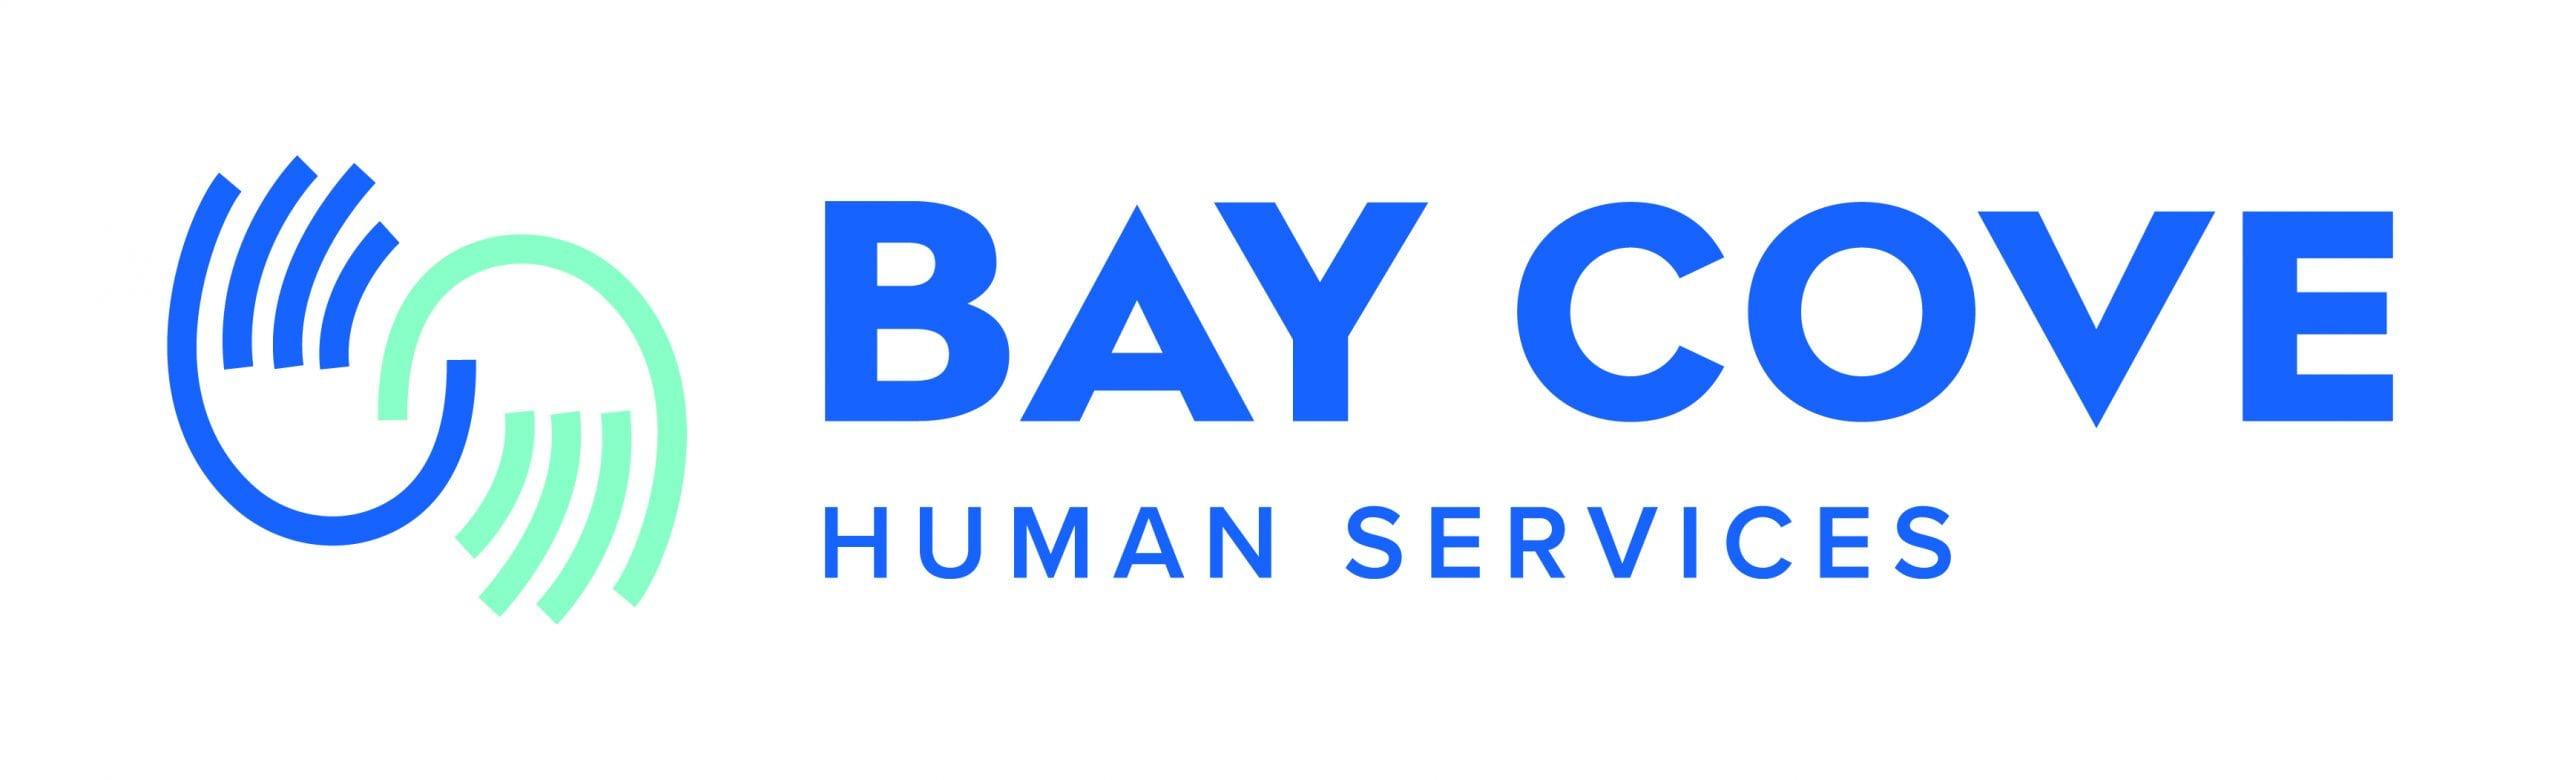 Bay Cove Human Services Logo